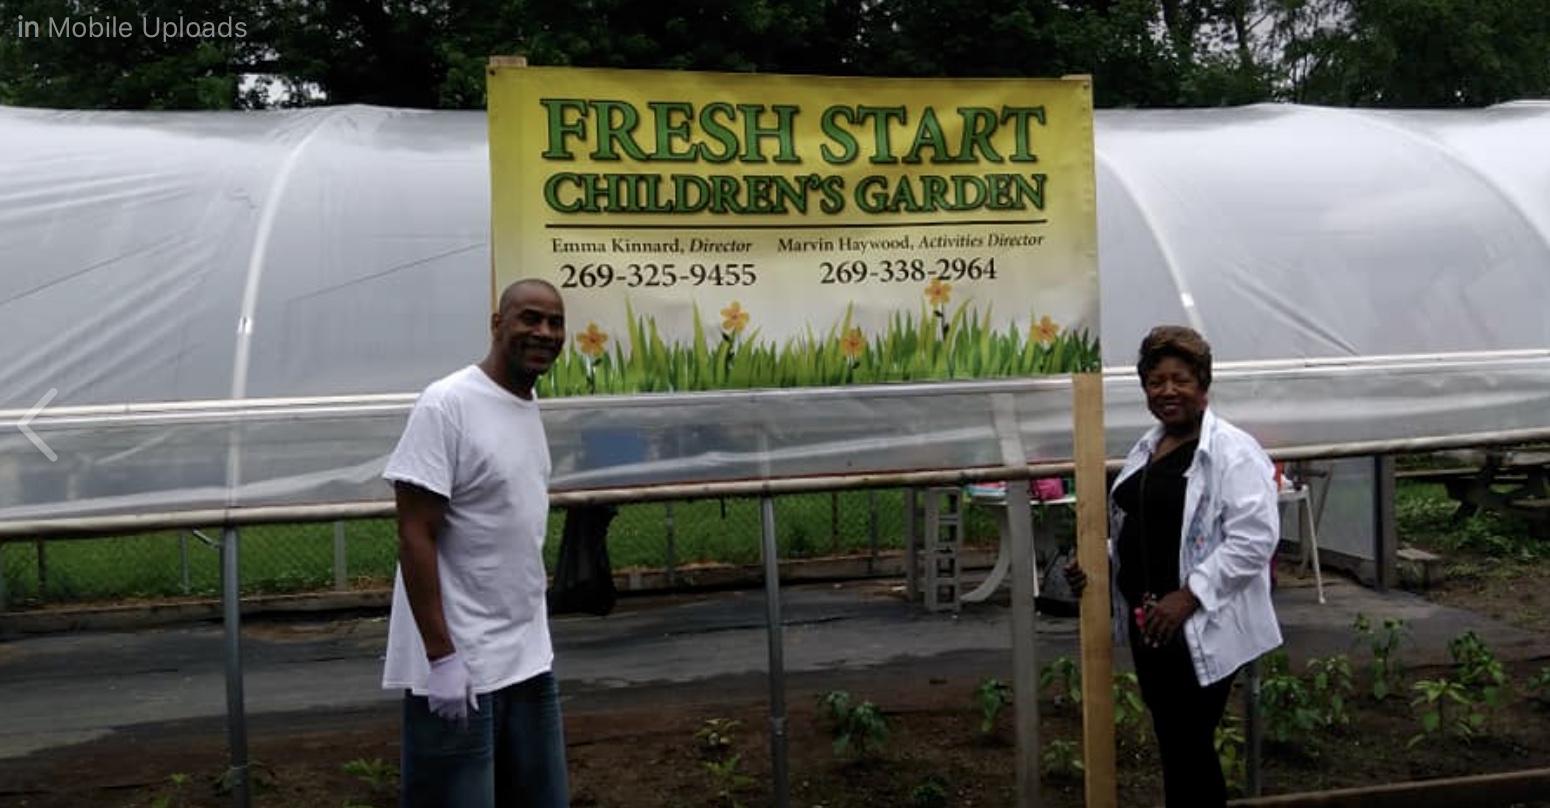 Thursday Gardening: Fresh Start Children's Garden @ Fresh Start Children's Garden | Benton Harbor | Michigan | United States